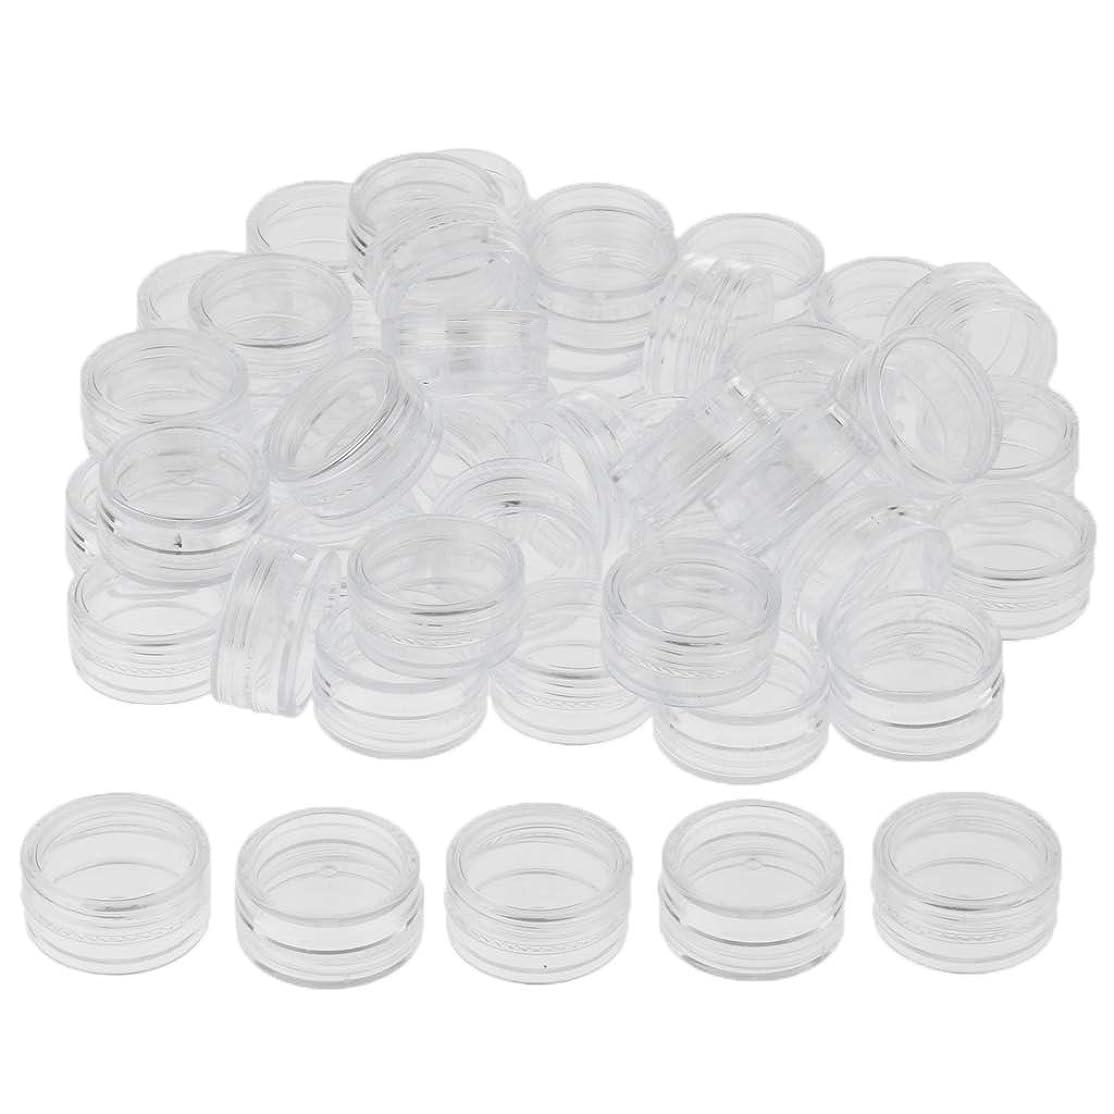 FLAMEER 約50個 化粧ポット ローションジャー クリーム コスメ 空容器 サンプルボトル 3サイズ選べ - 5g